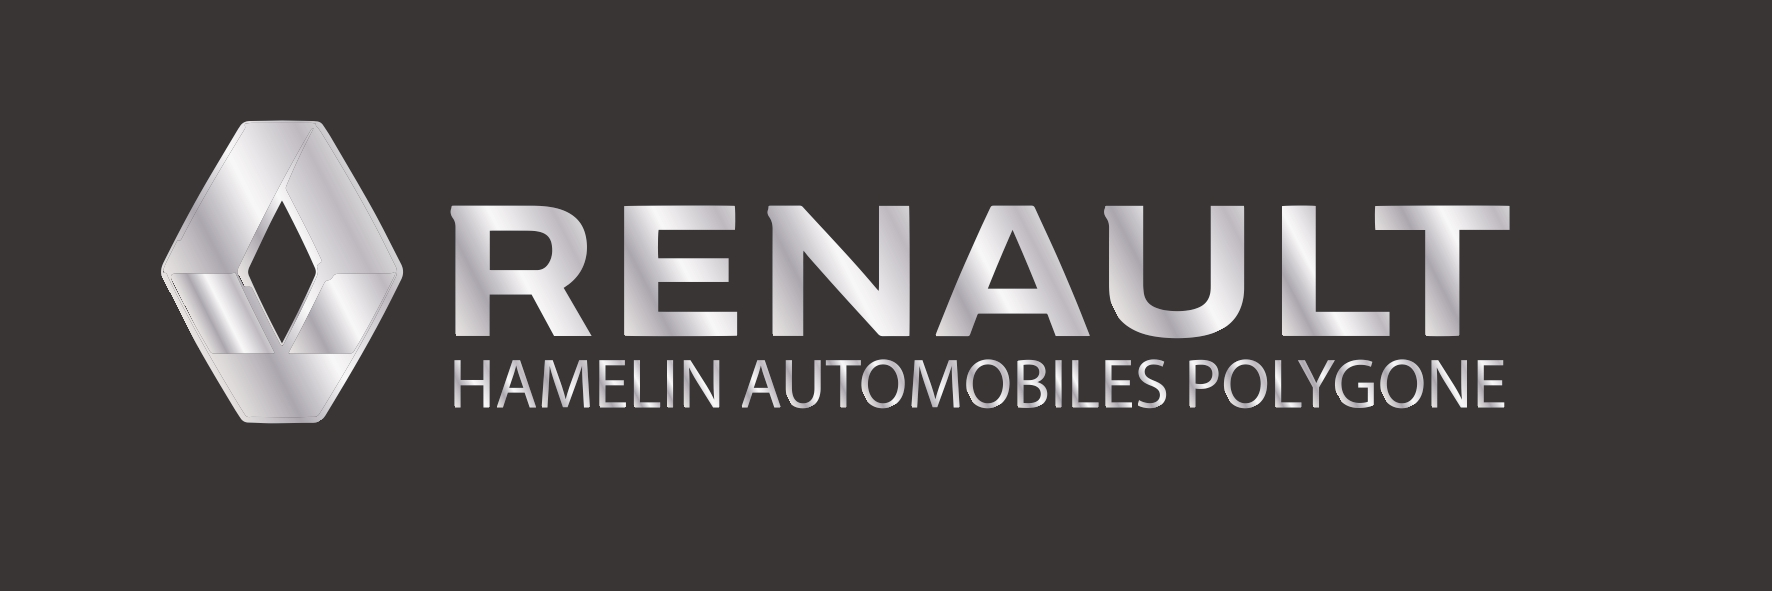 http://usepmm.fr/wp-content/uploads/2021/03/Renault-gris_page-0001.jpg